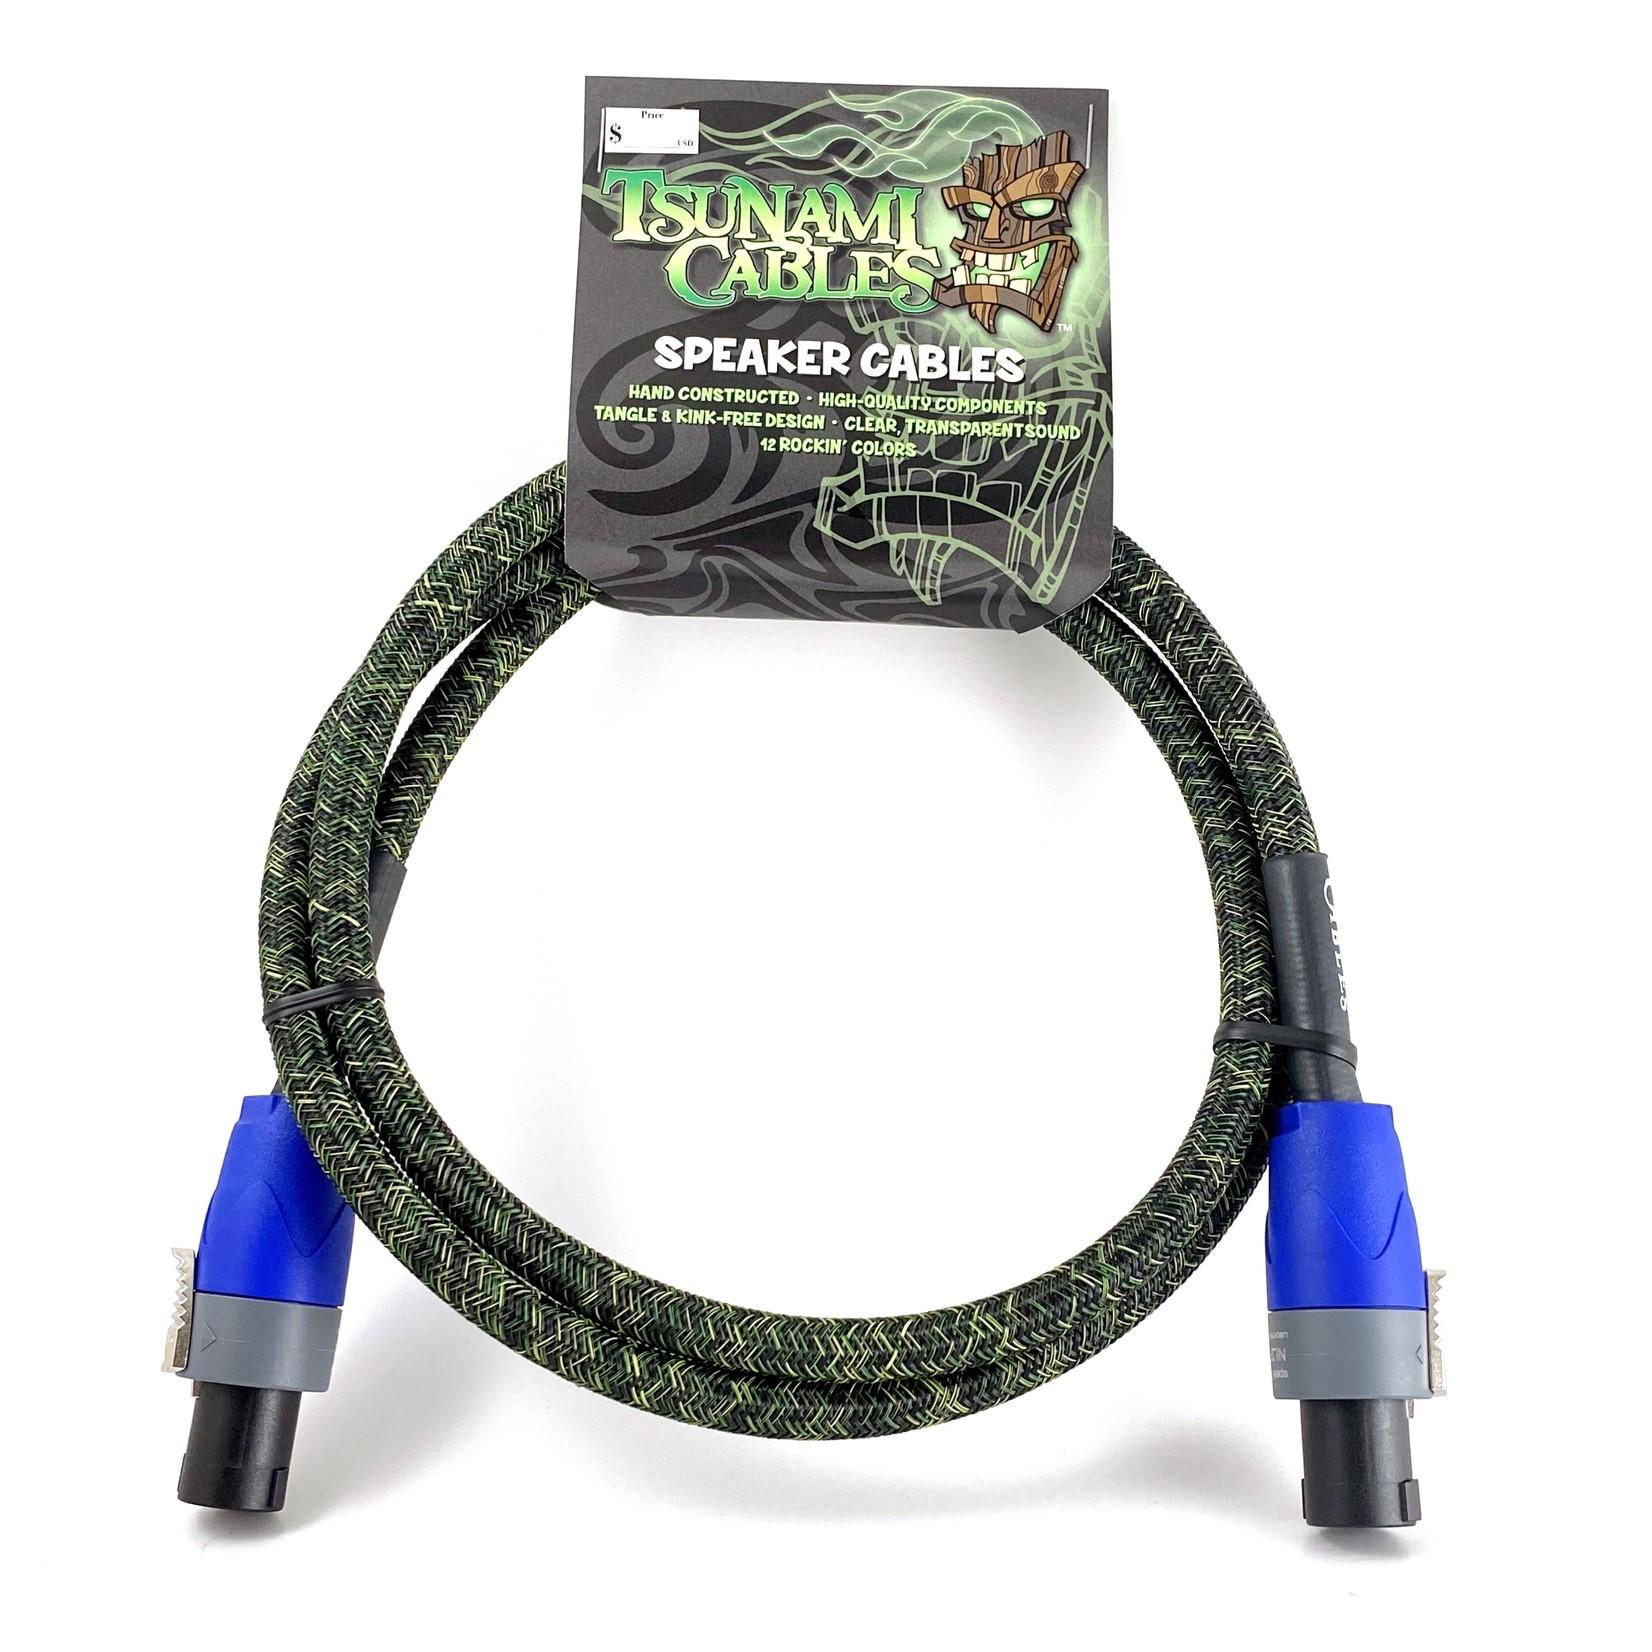 "Tsunami Cables Tsunami Cables 5' Handcrafted Premium Speaker Cable, SpeakON Connectors - ""Camouflage"""